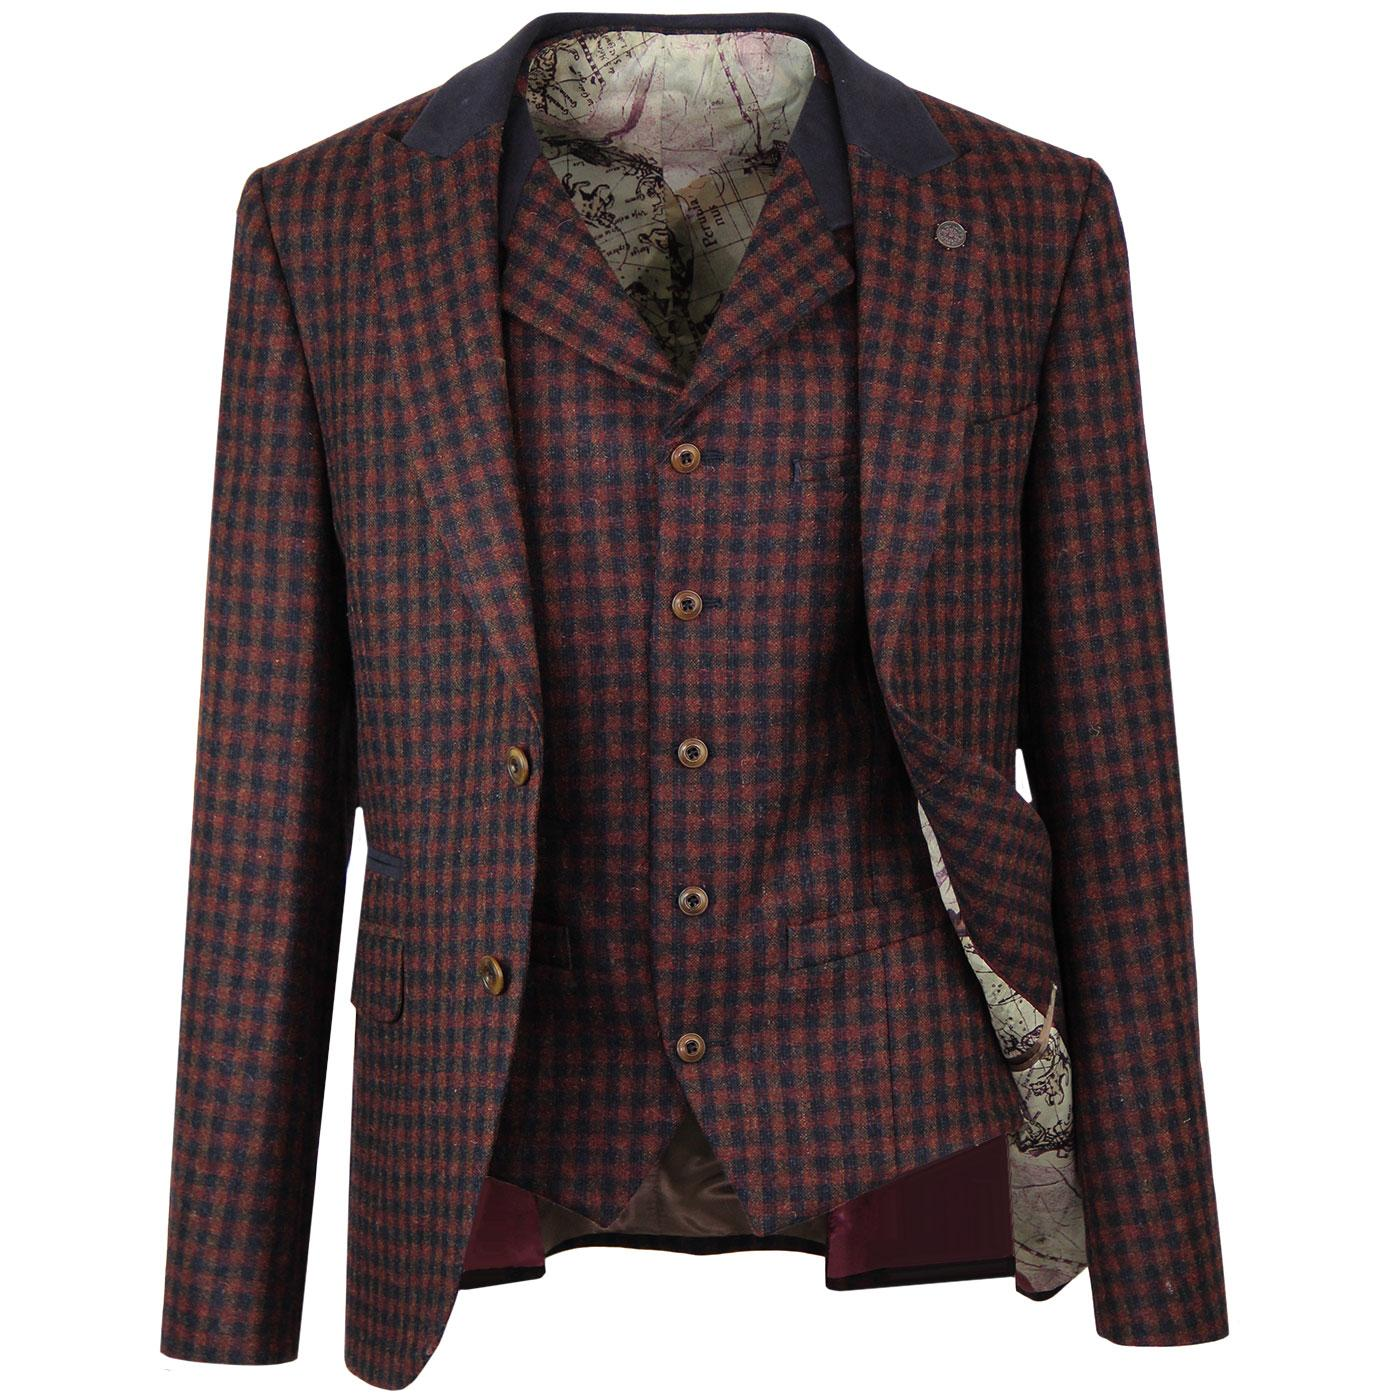 GIBSON LONDON Retro Teddy Boy Jacket & Waistcoat